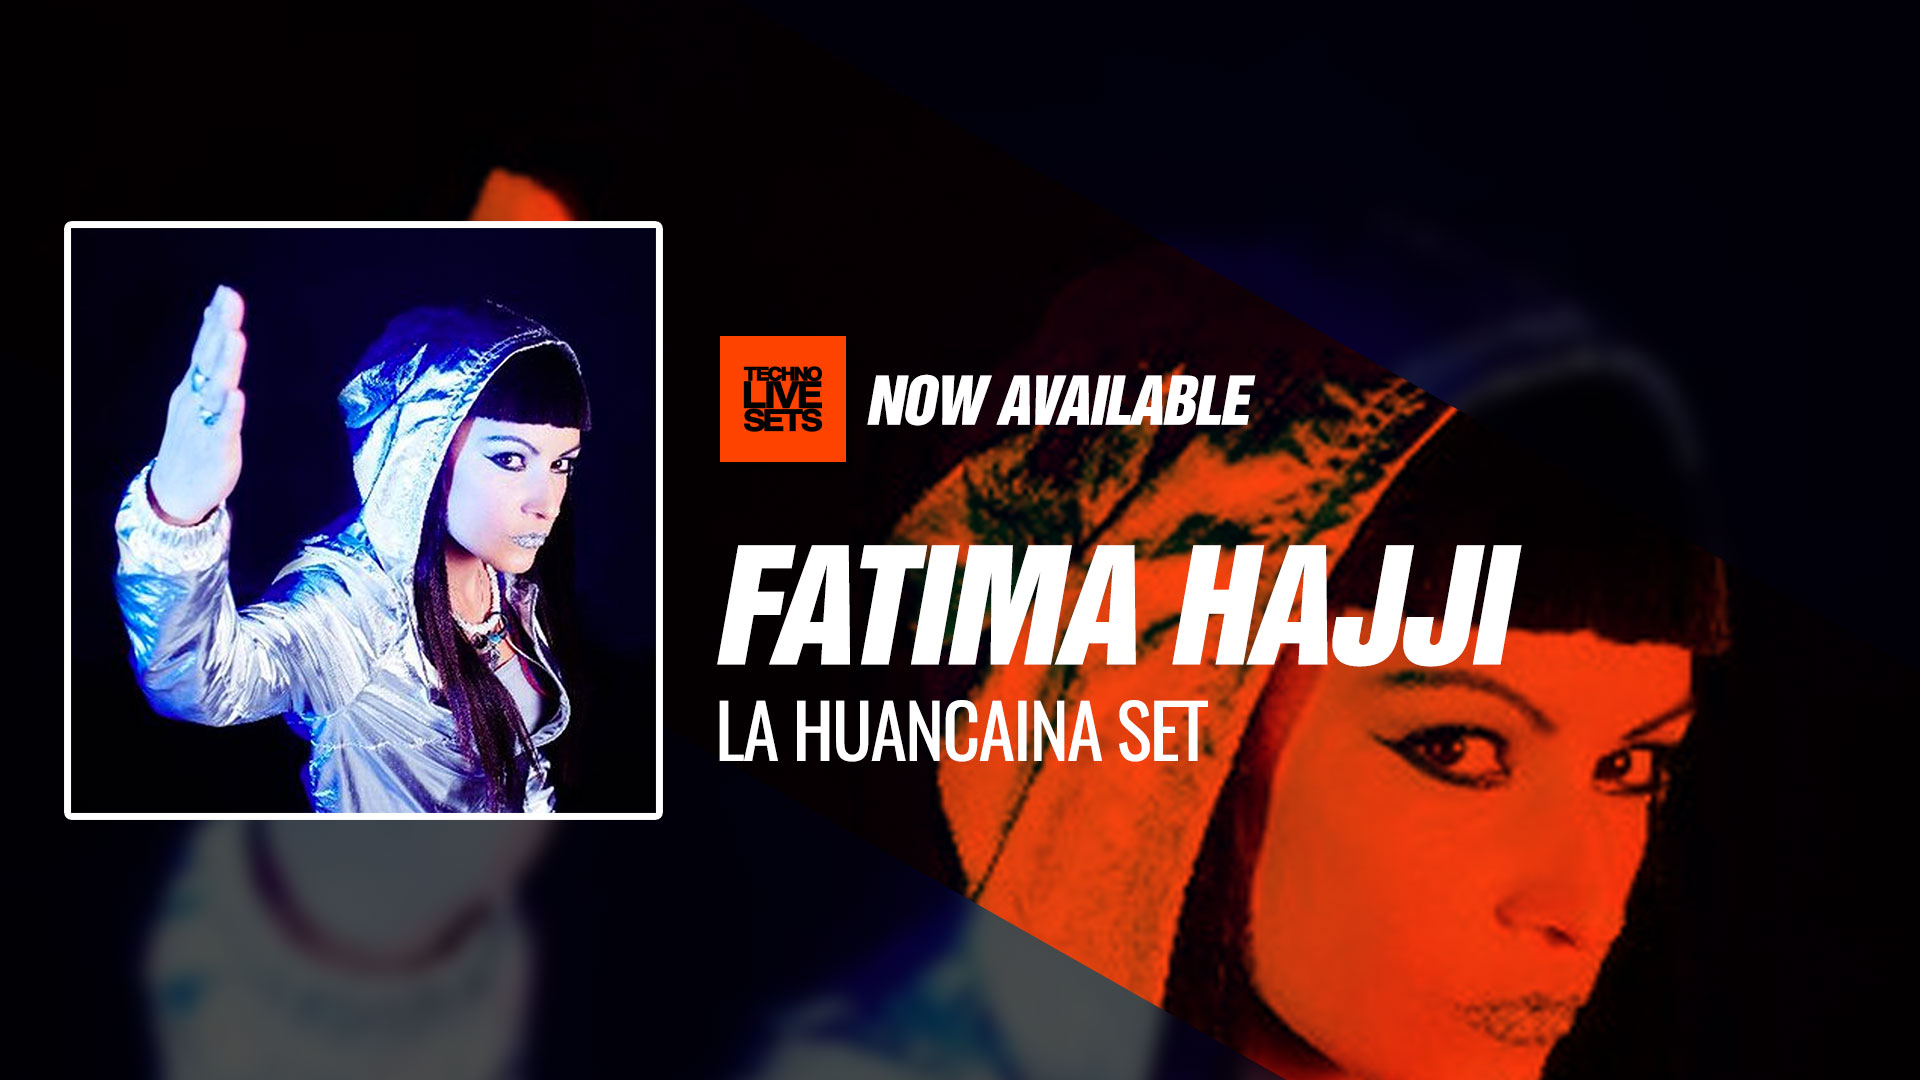 Fatima Hajji 2017 La Huancaina Set 30-11-2017